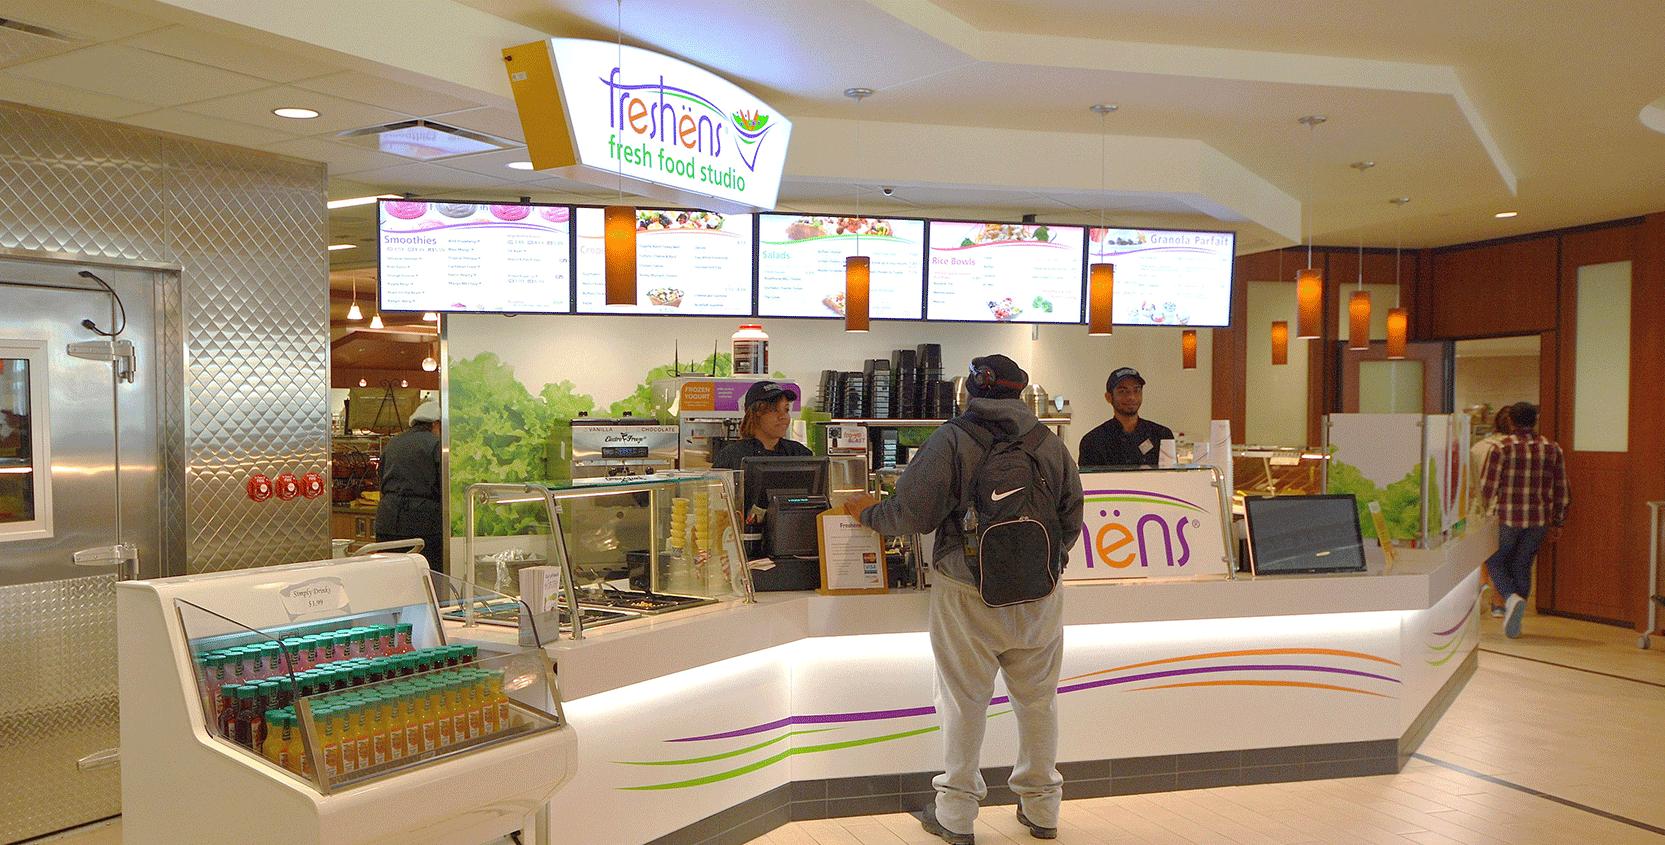 Ferris-State-University-University-Center-Food-Court-5-1665x845